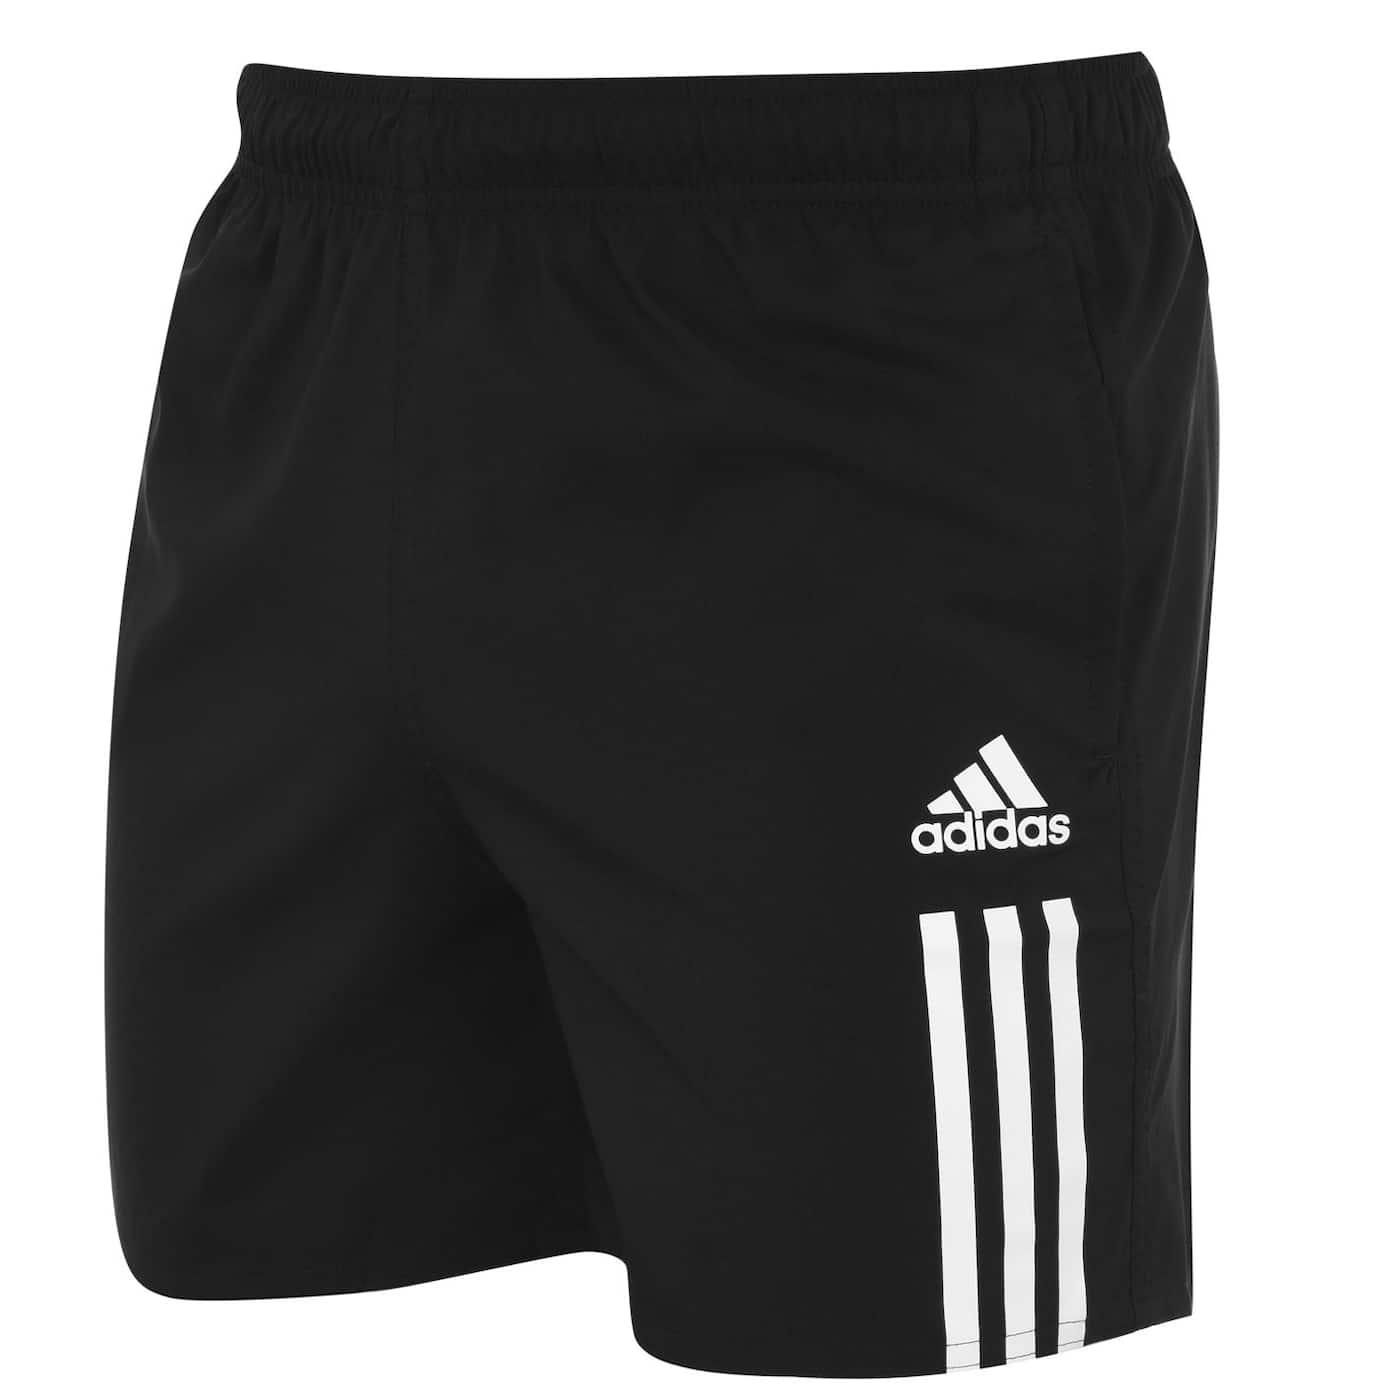 Men's swim shorts Adidas 3 Stripe